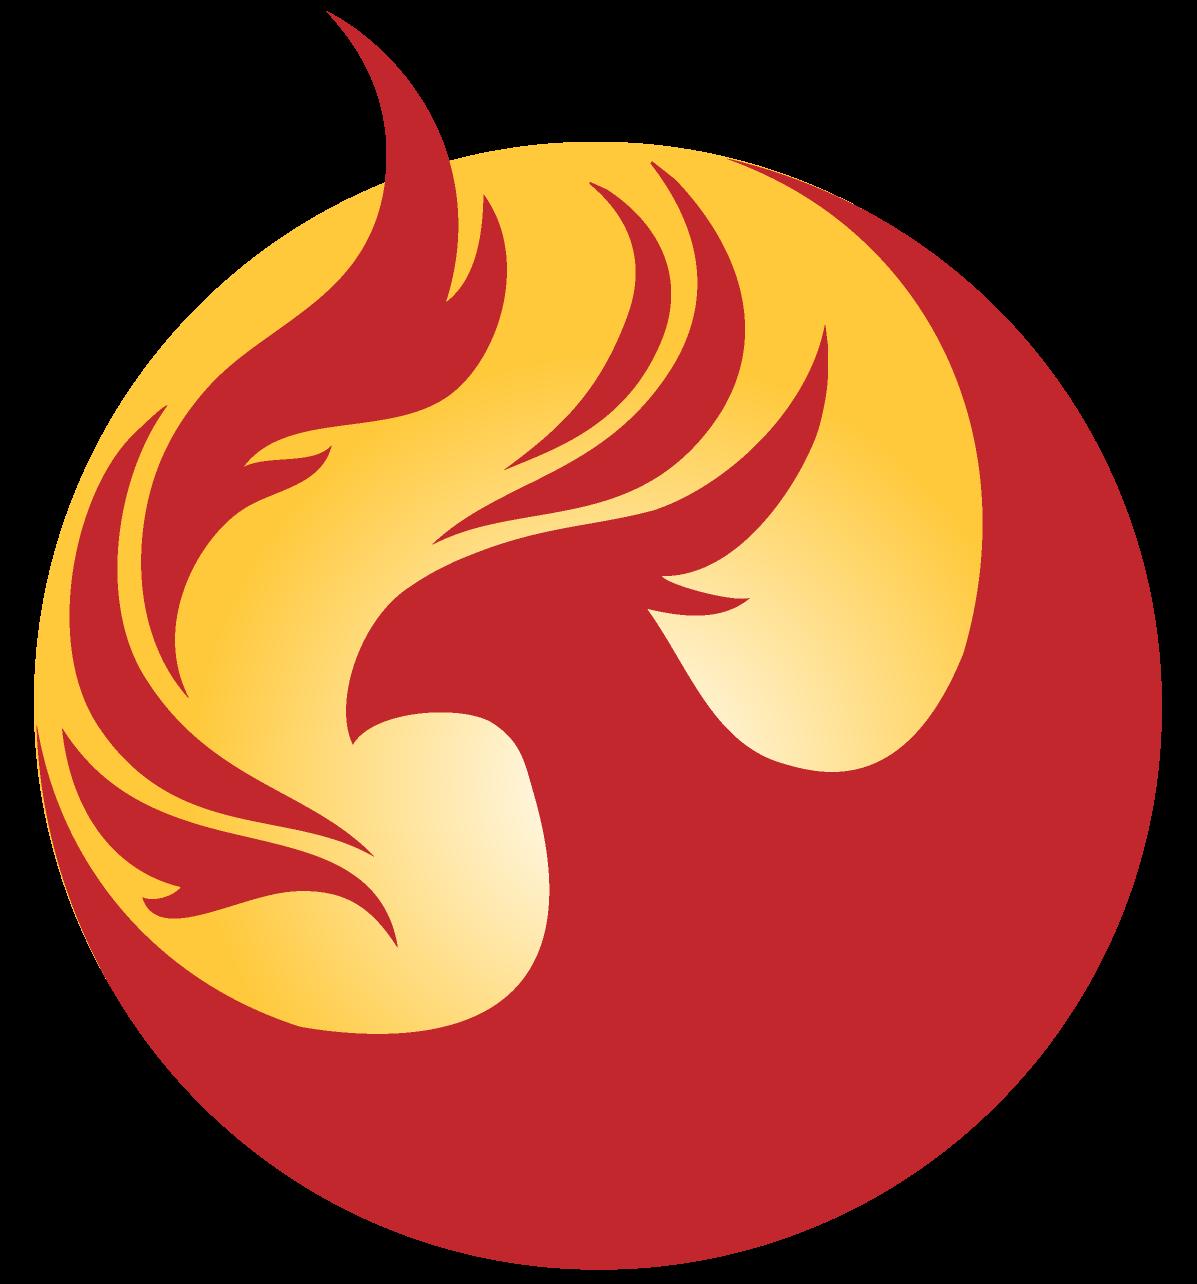 Fighting clipart abhor. Phoenix logo arizona pinterest